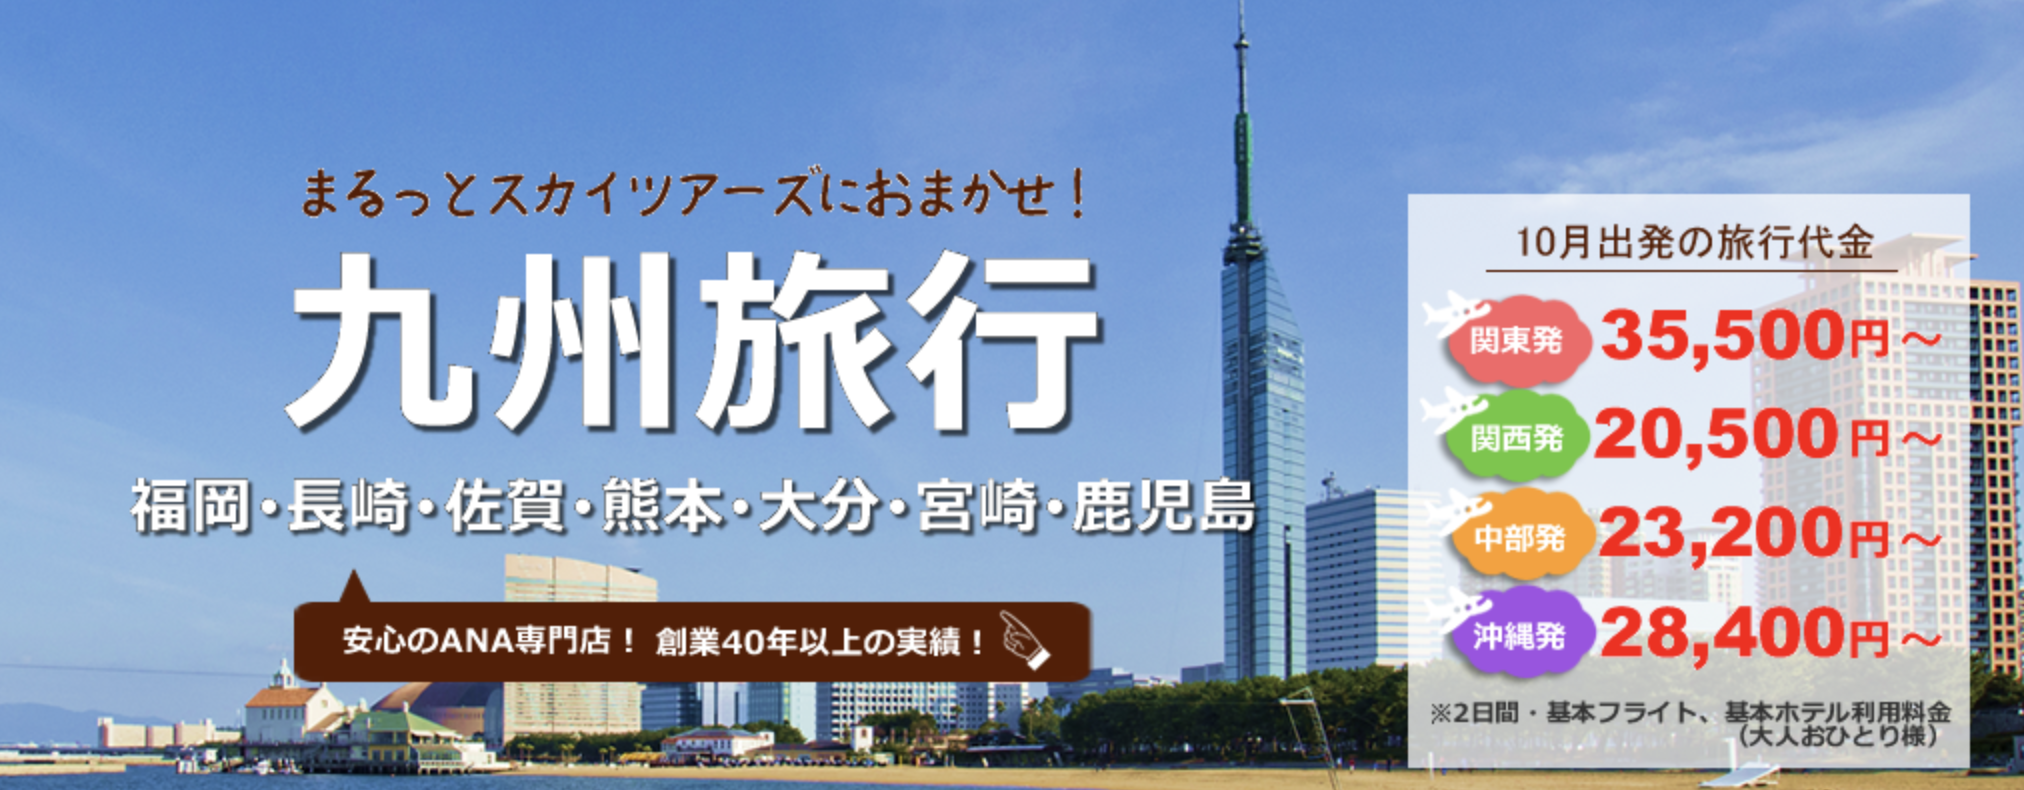 ANAスカイツアーズの国内ツアー予約(九州旅行特集)